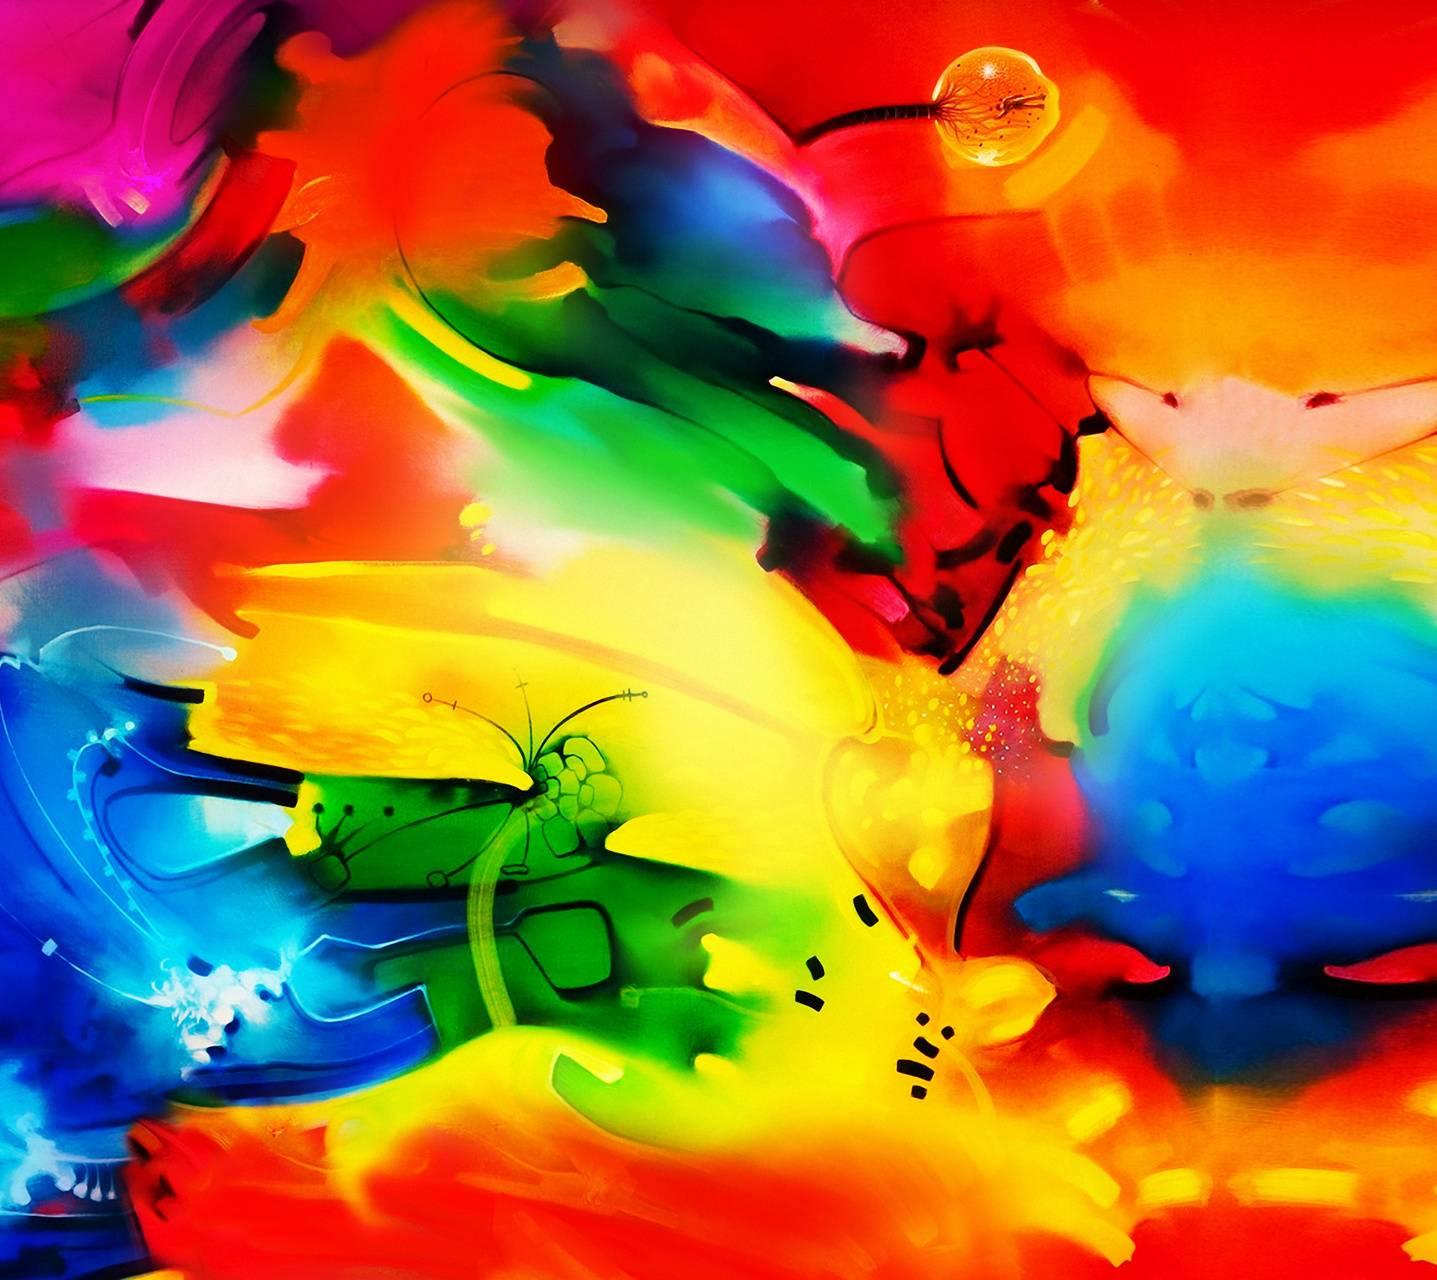 Fantasy Abstract